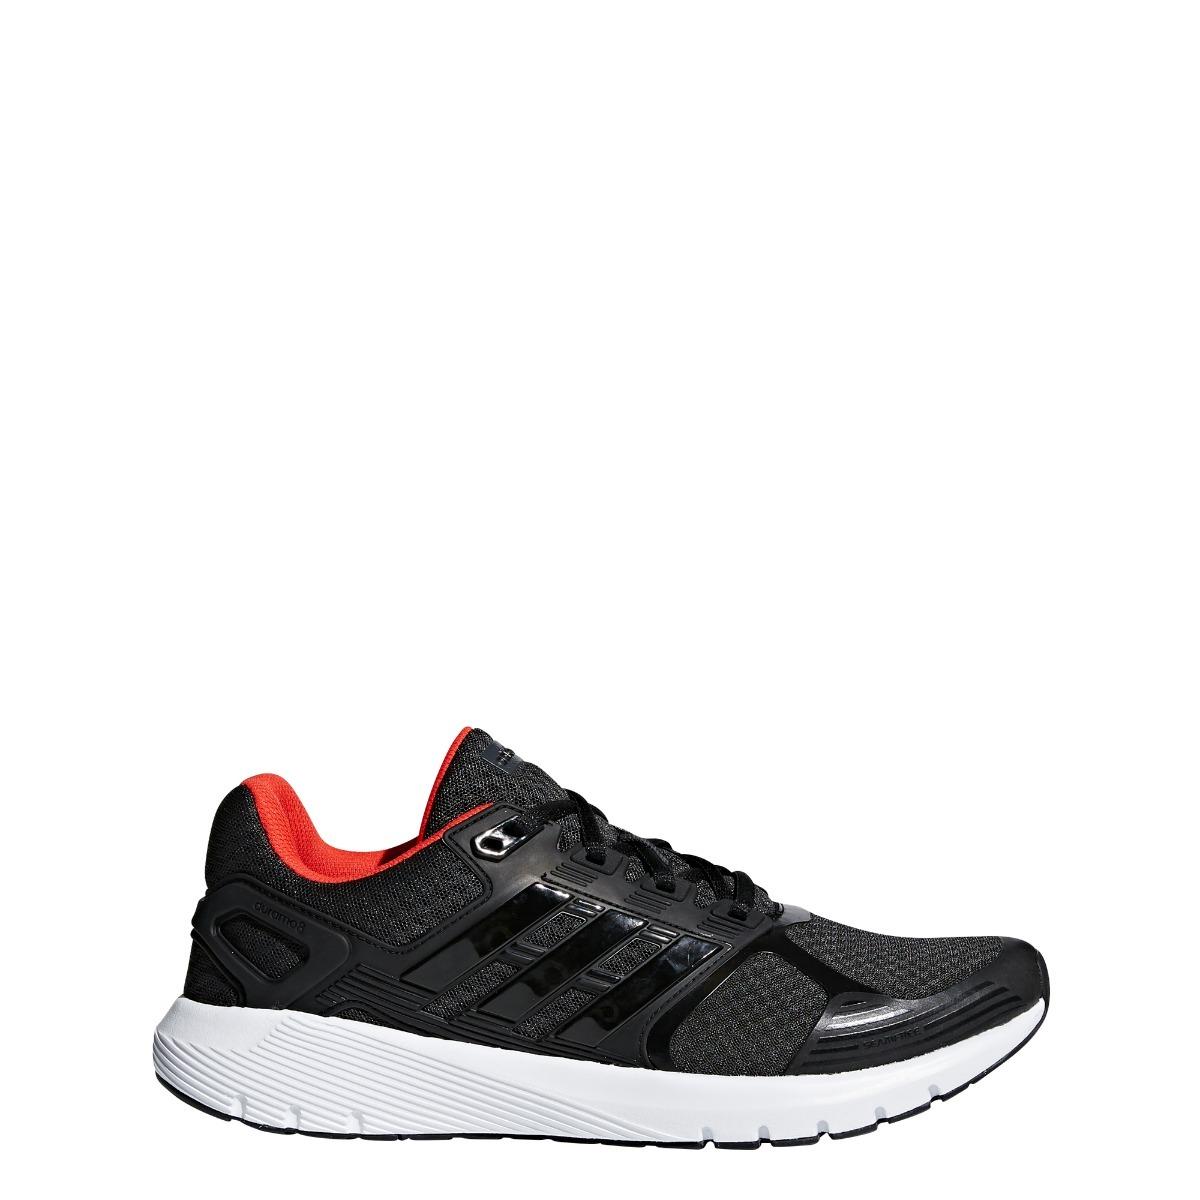 best cheap bce23 2ab61 zapatillas adidas duramo 8 m neg-roj hombres. Cargando zoom.